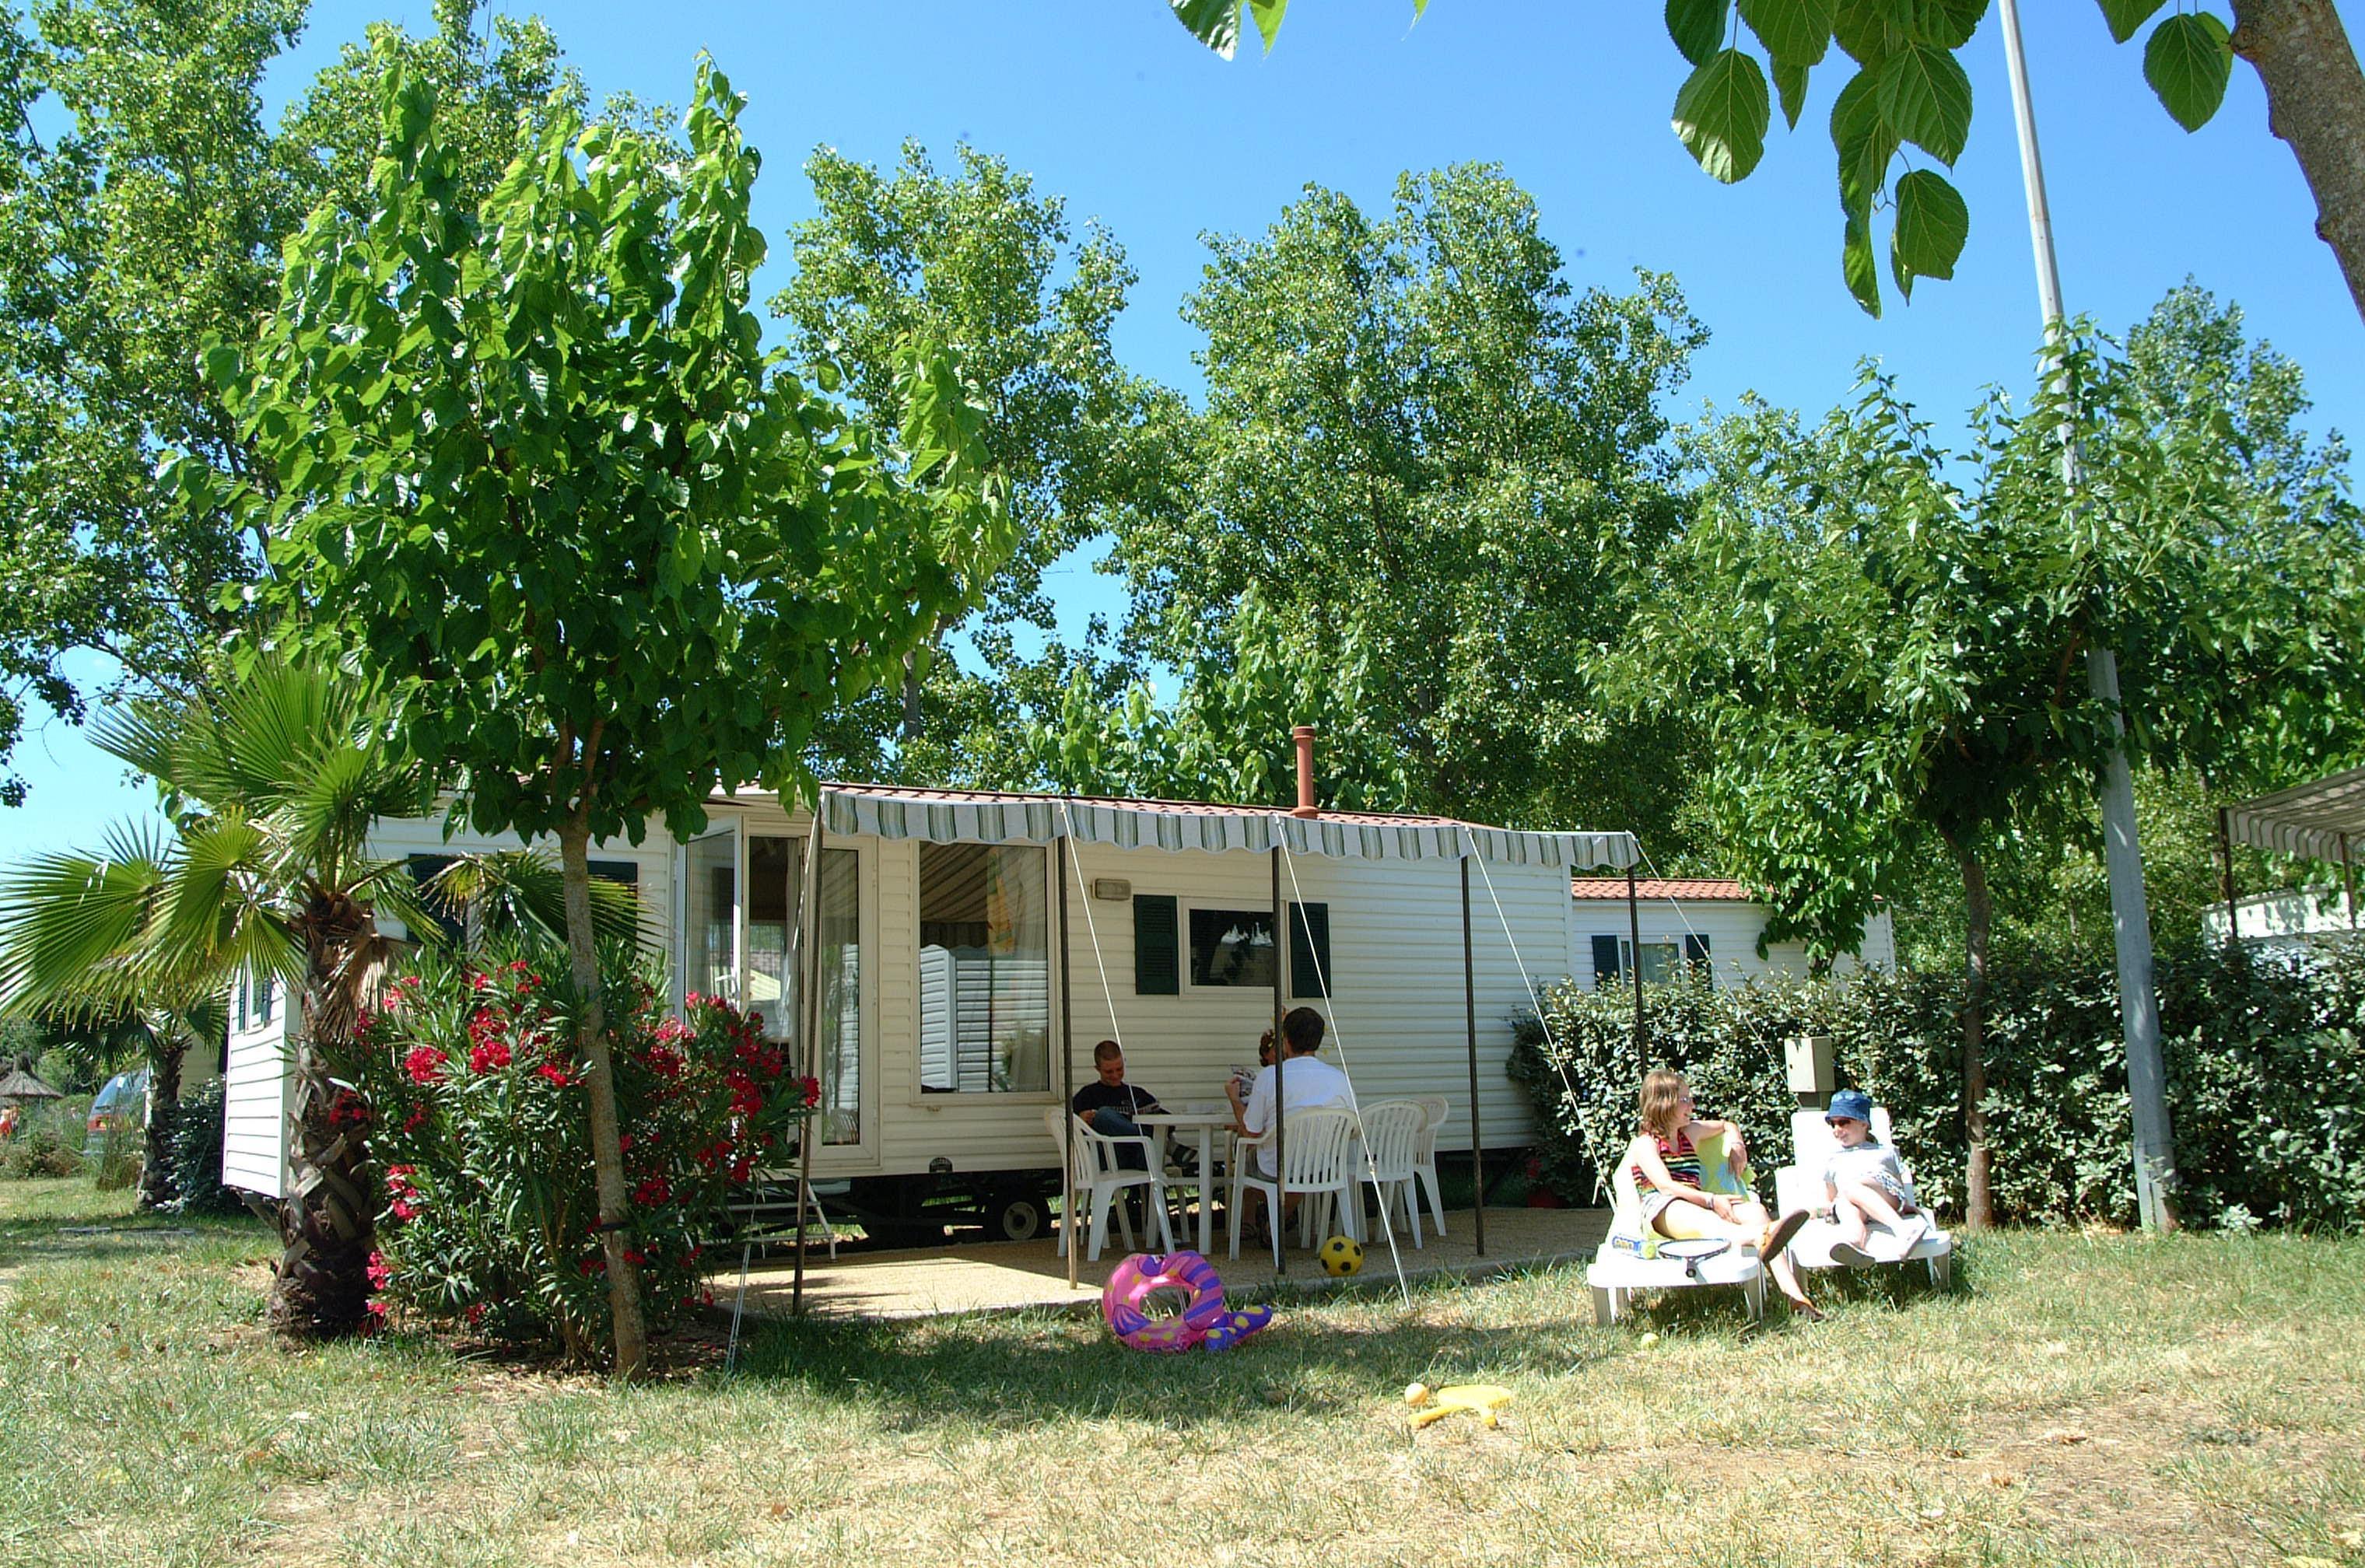 Location - Tampico, Confort- Dimanche - 2 Chambres - Camping L'Air Marin